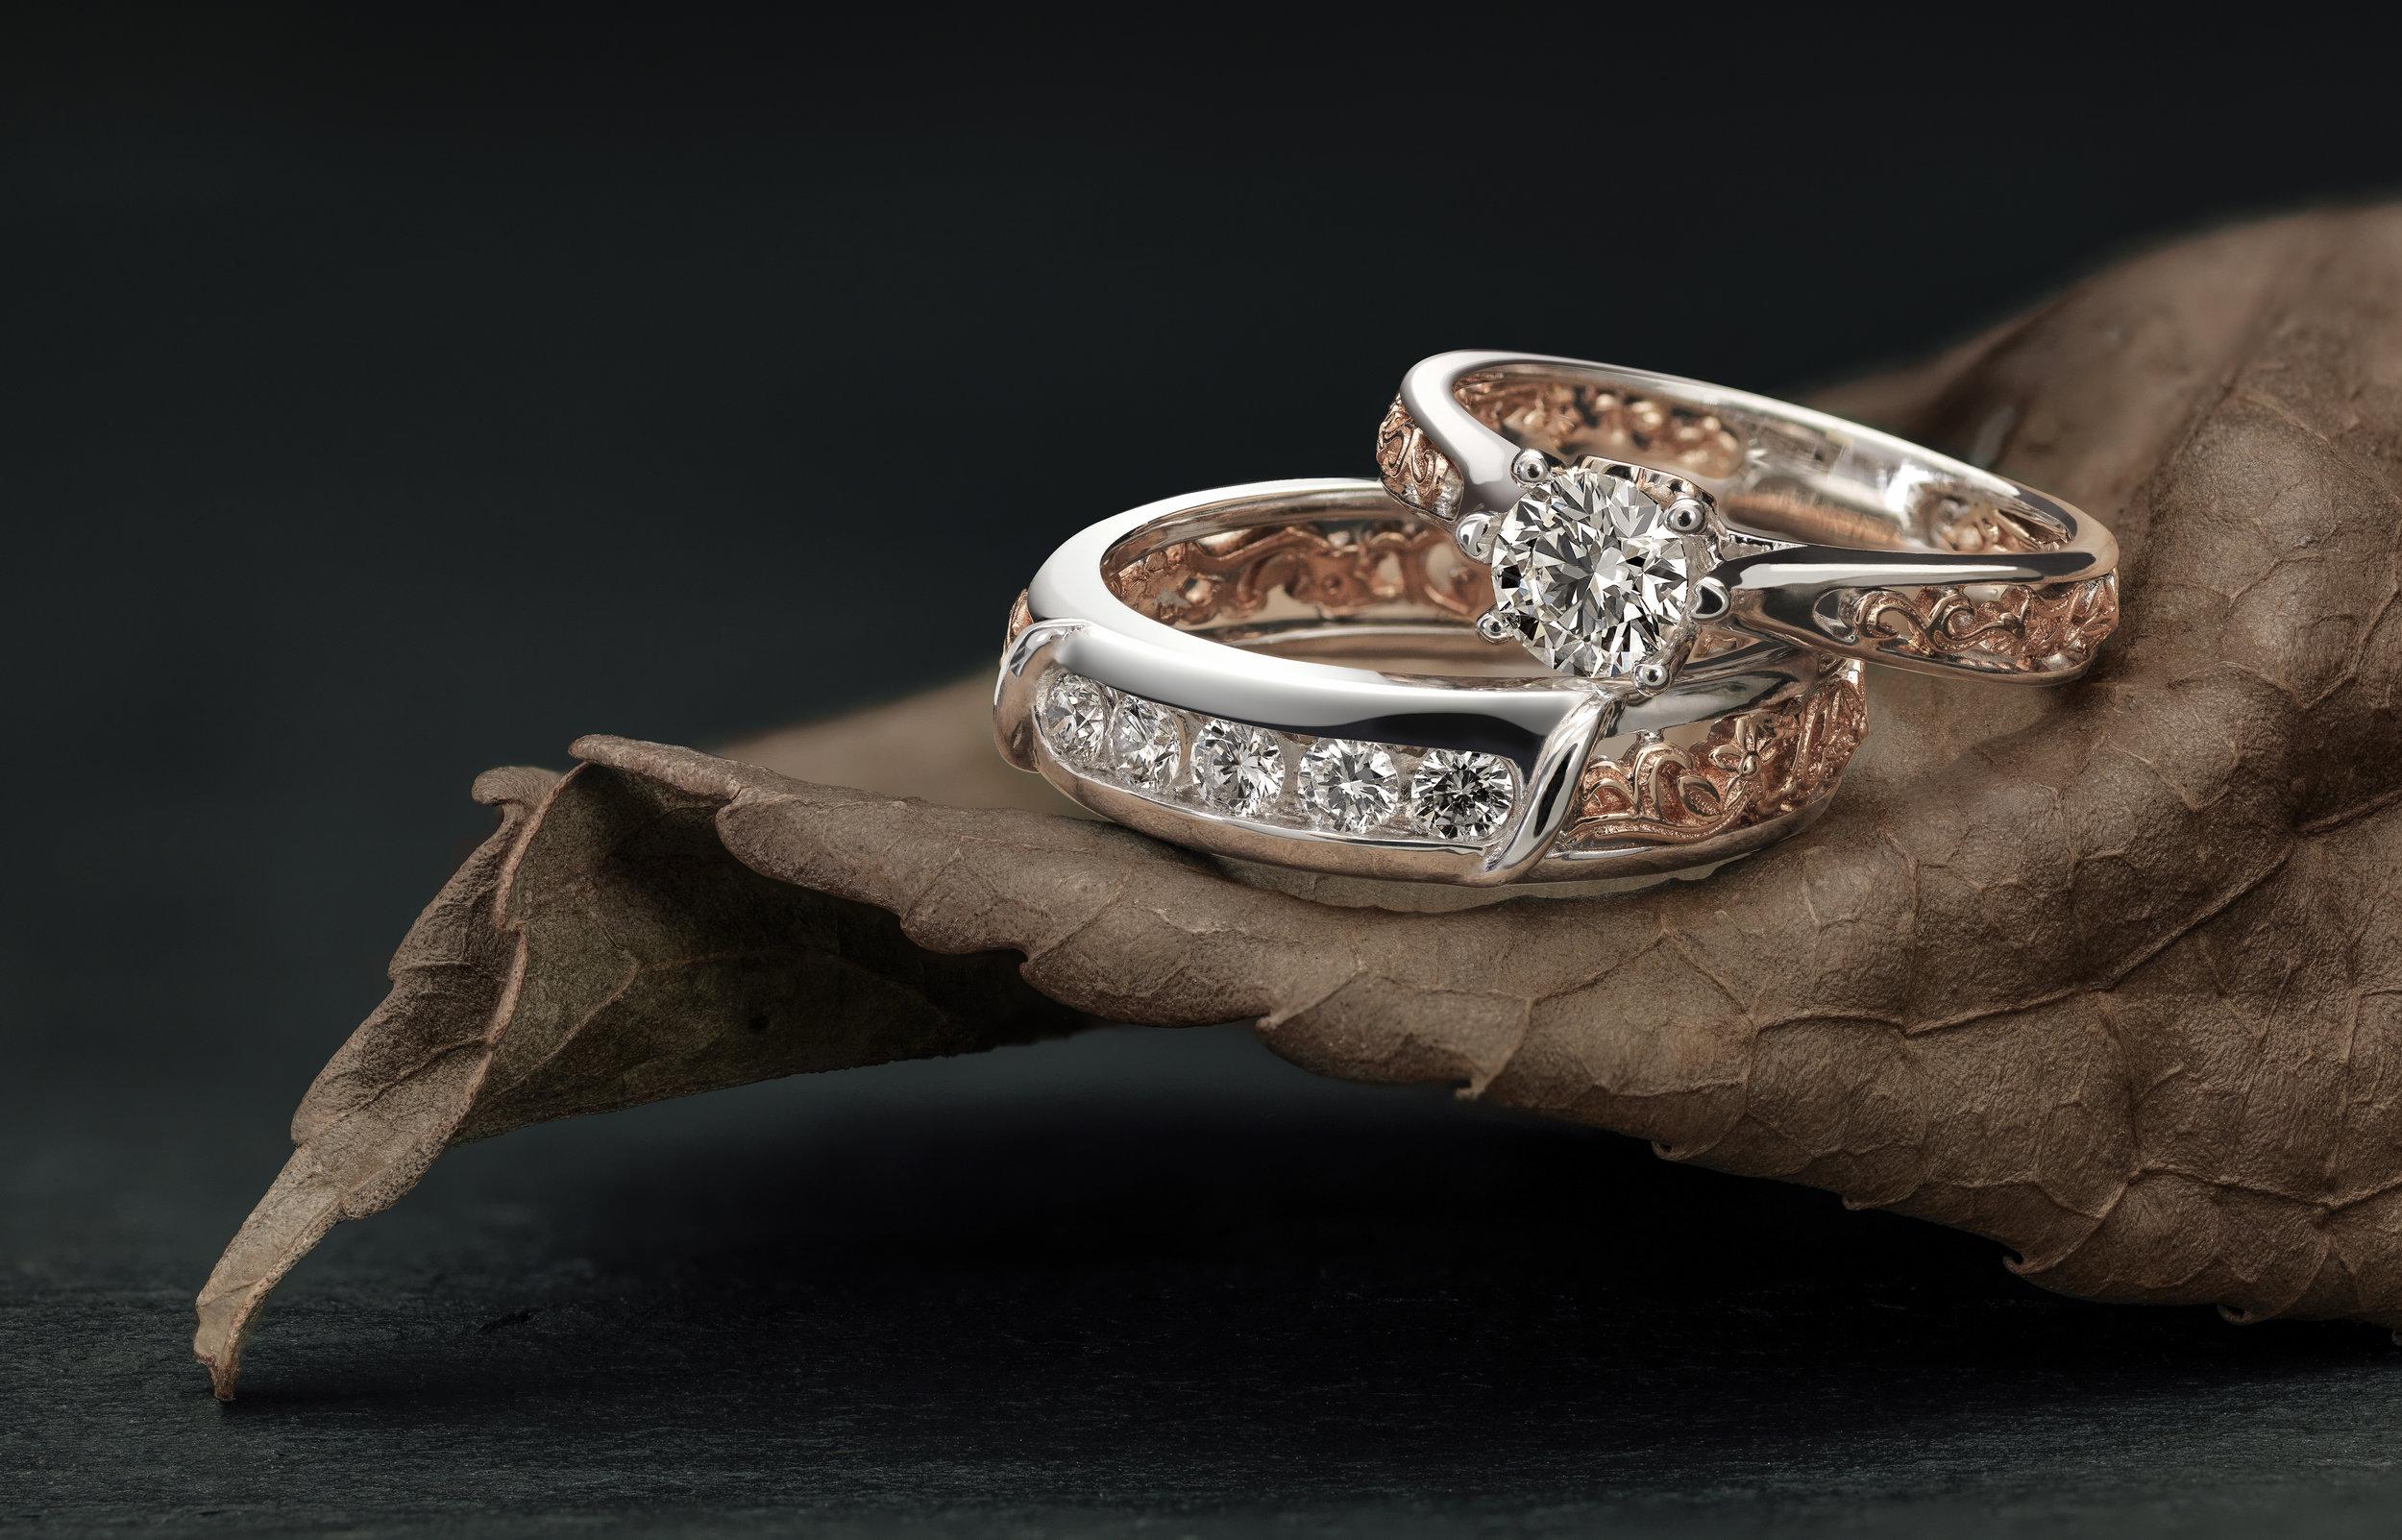 David-Thompson-2015-04-10_Diamond-Rings.jpg